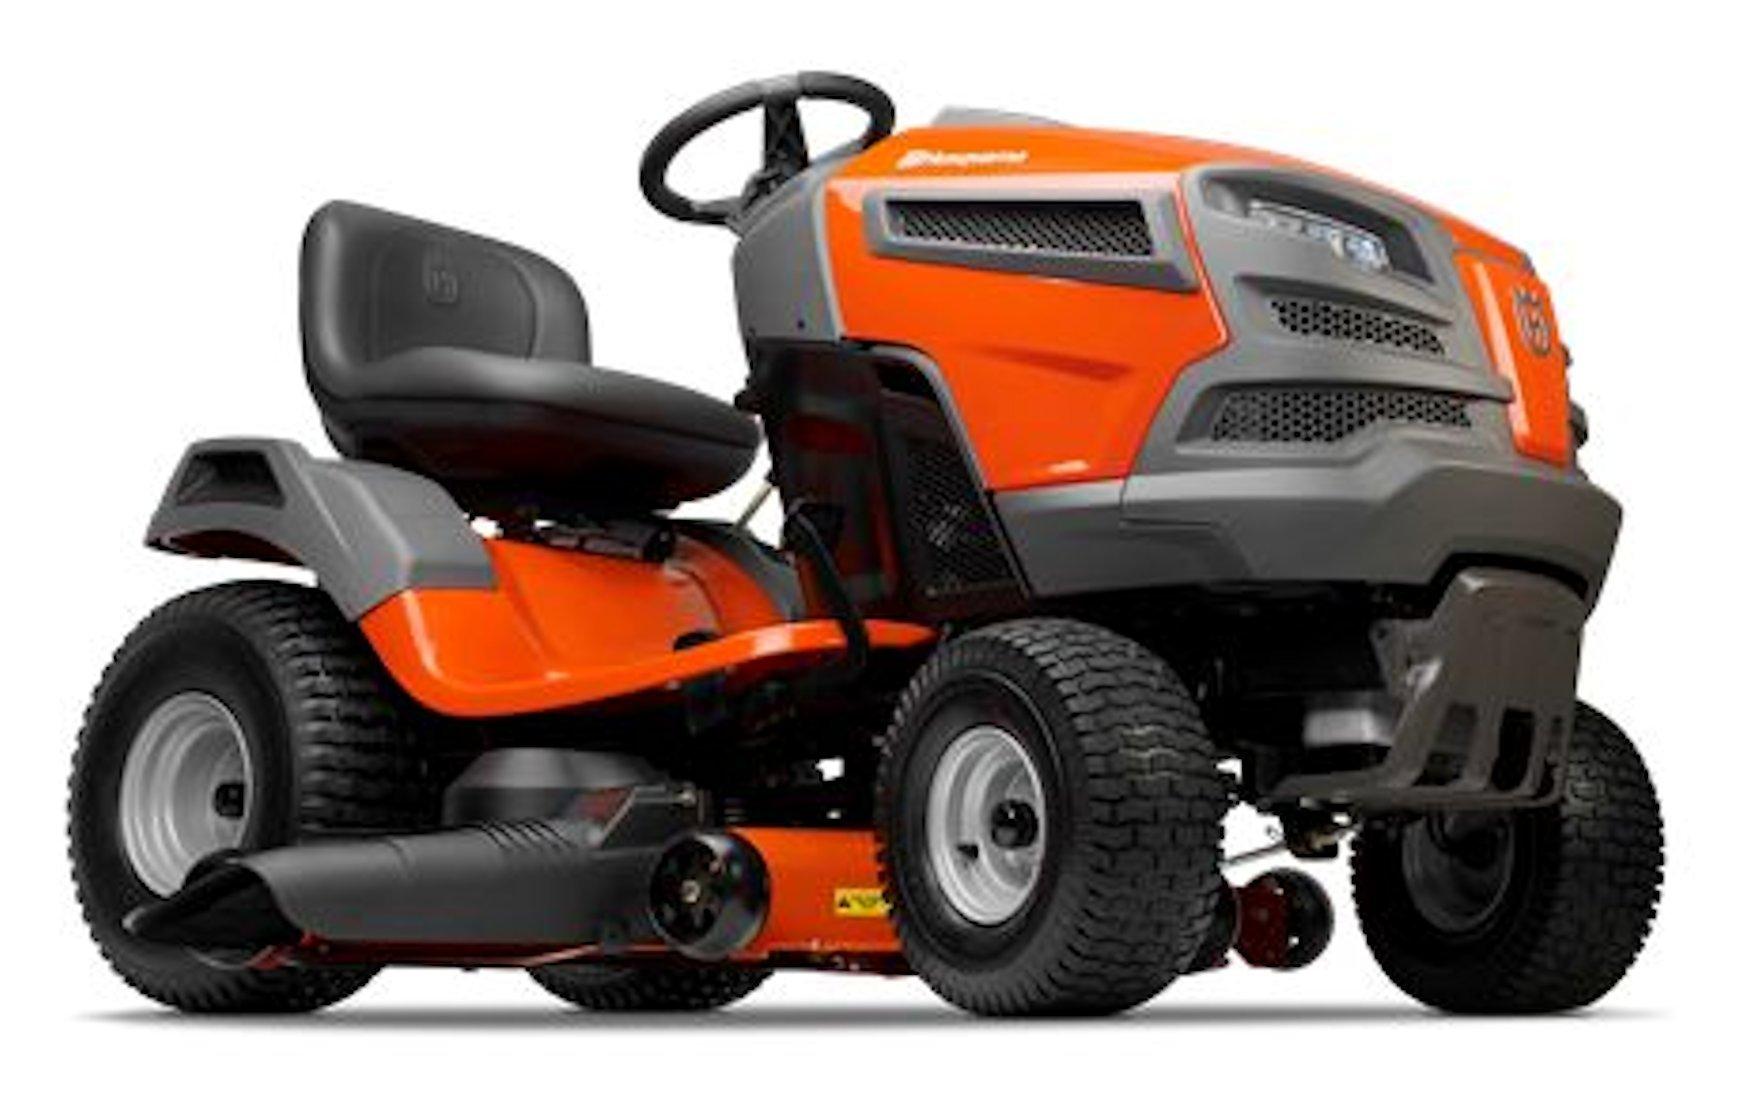 Husqvarna YTH20K42 20HP 725cc Kohler 7000 42'' Lawn Tractor #960430274